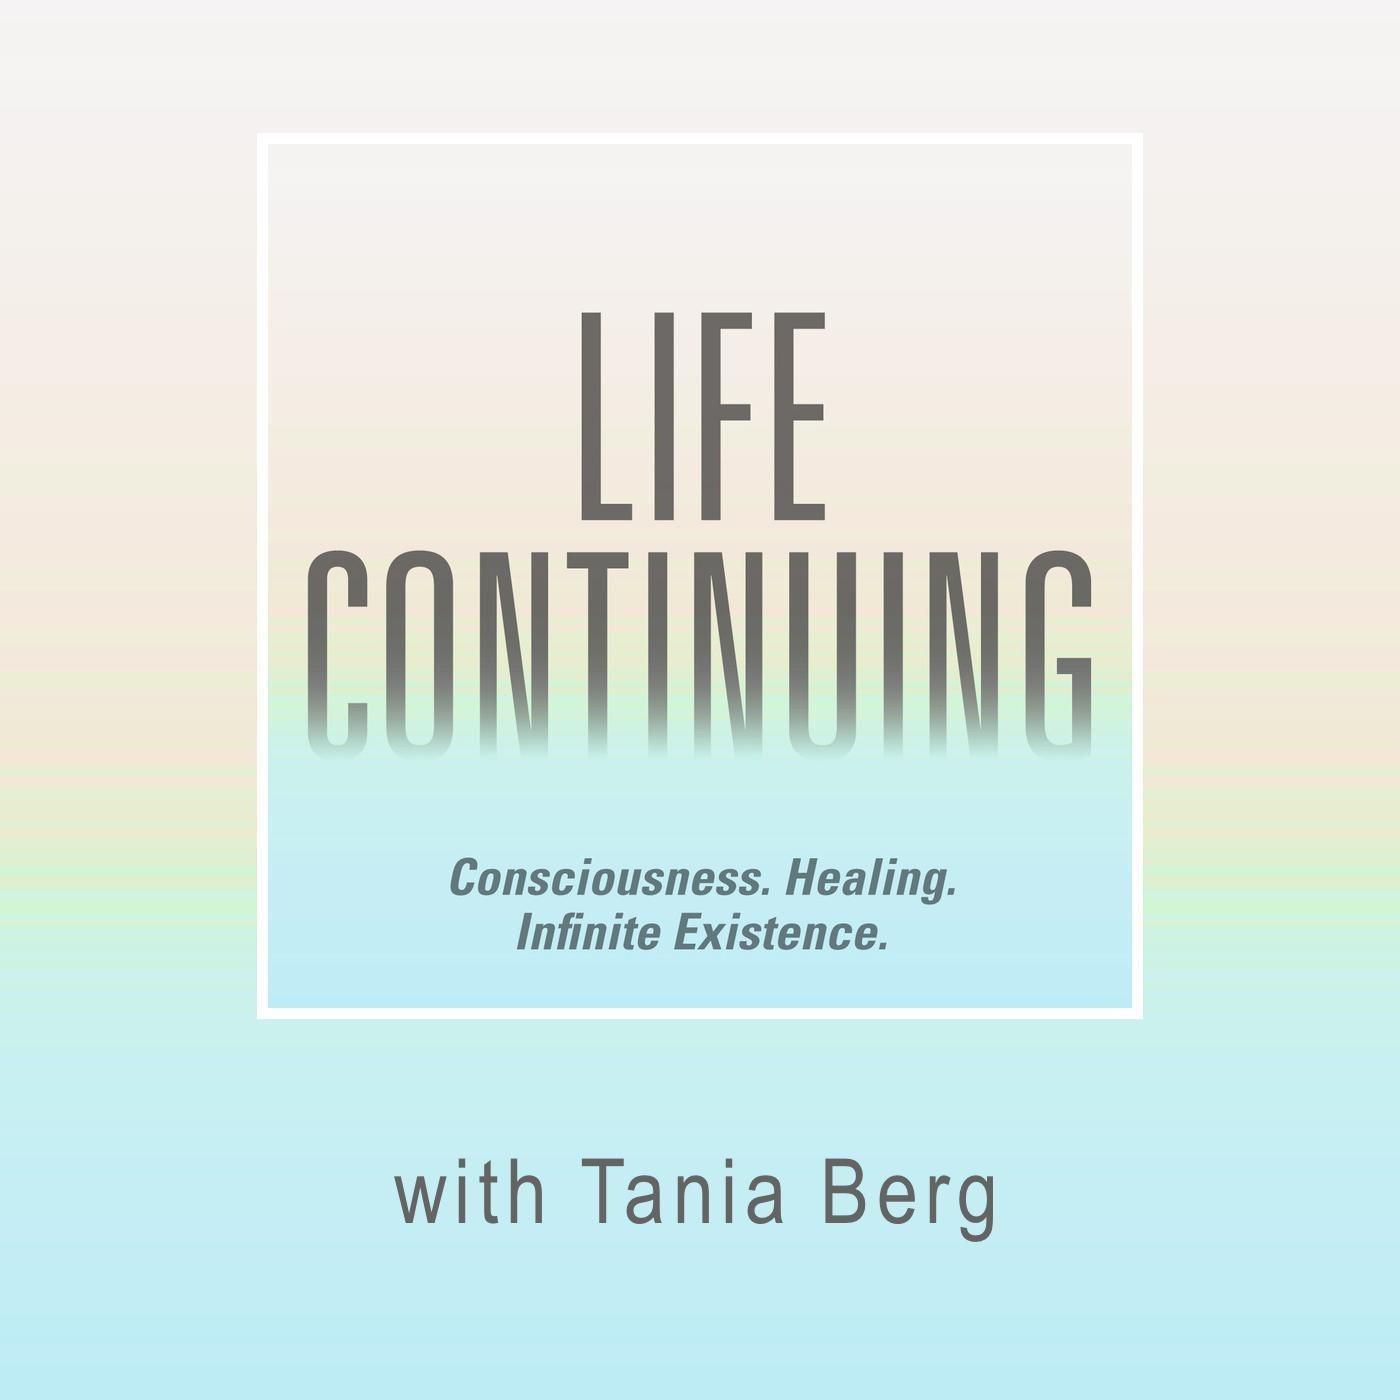 Life Continuing